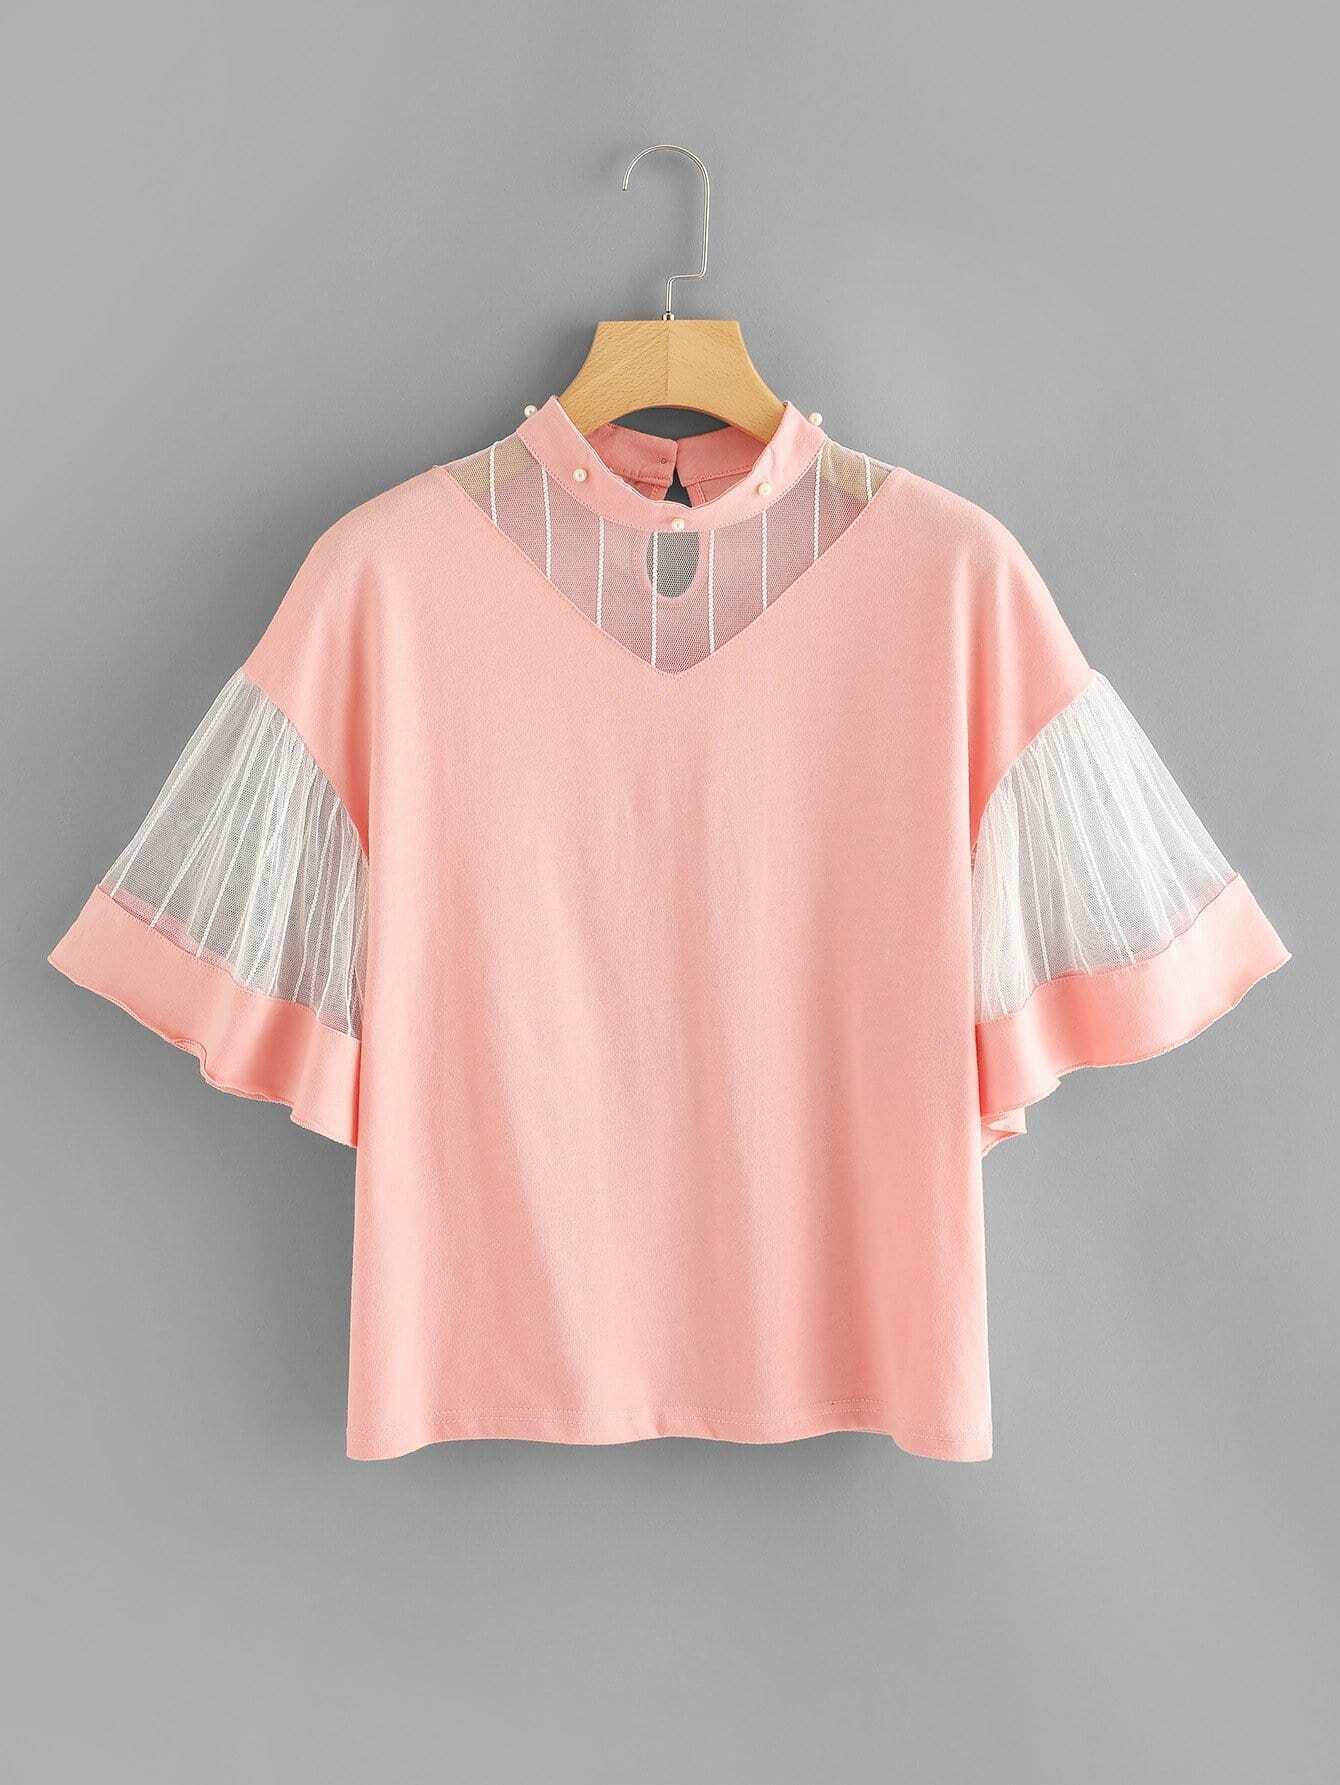 Mesh Contrast Flounce Sleeve Top mesh contrast flounce sleeve top